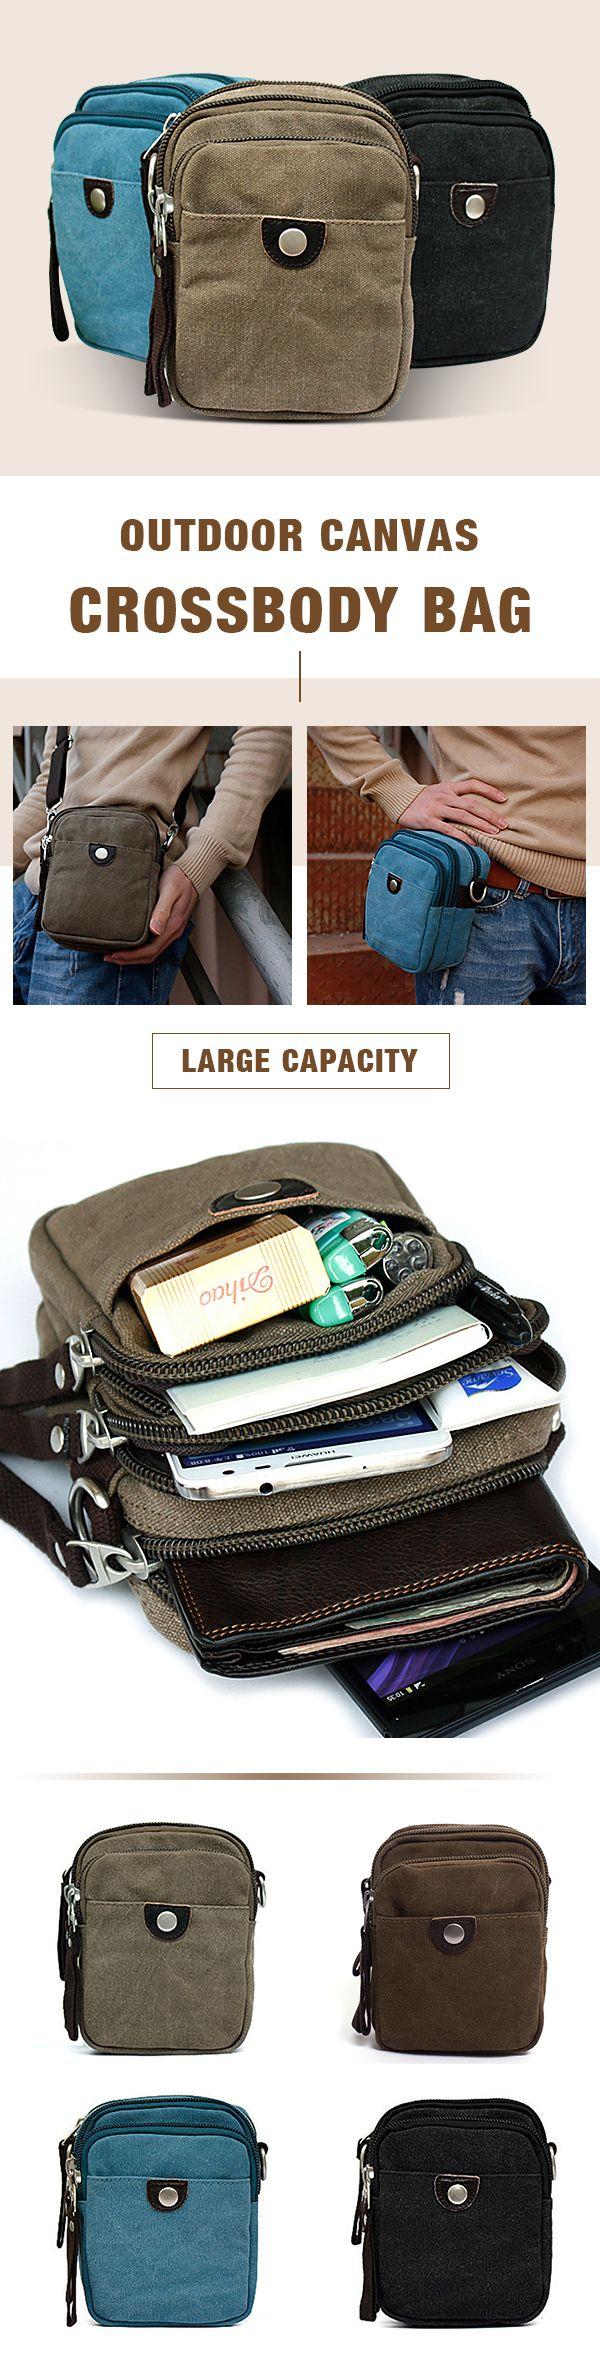 US$26.81 Canvas Large Capacity Outdoor Crossbody Bag Waist Bag For Men#bag #mensfashion #ThanksgivingRecipes